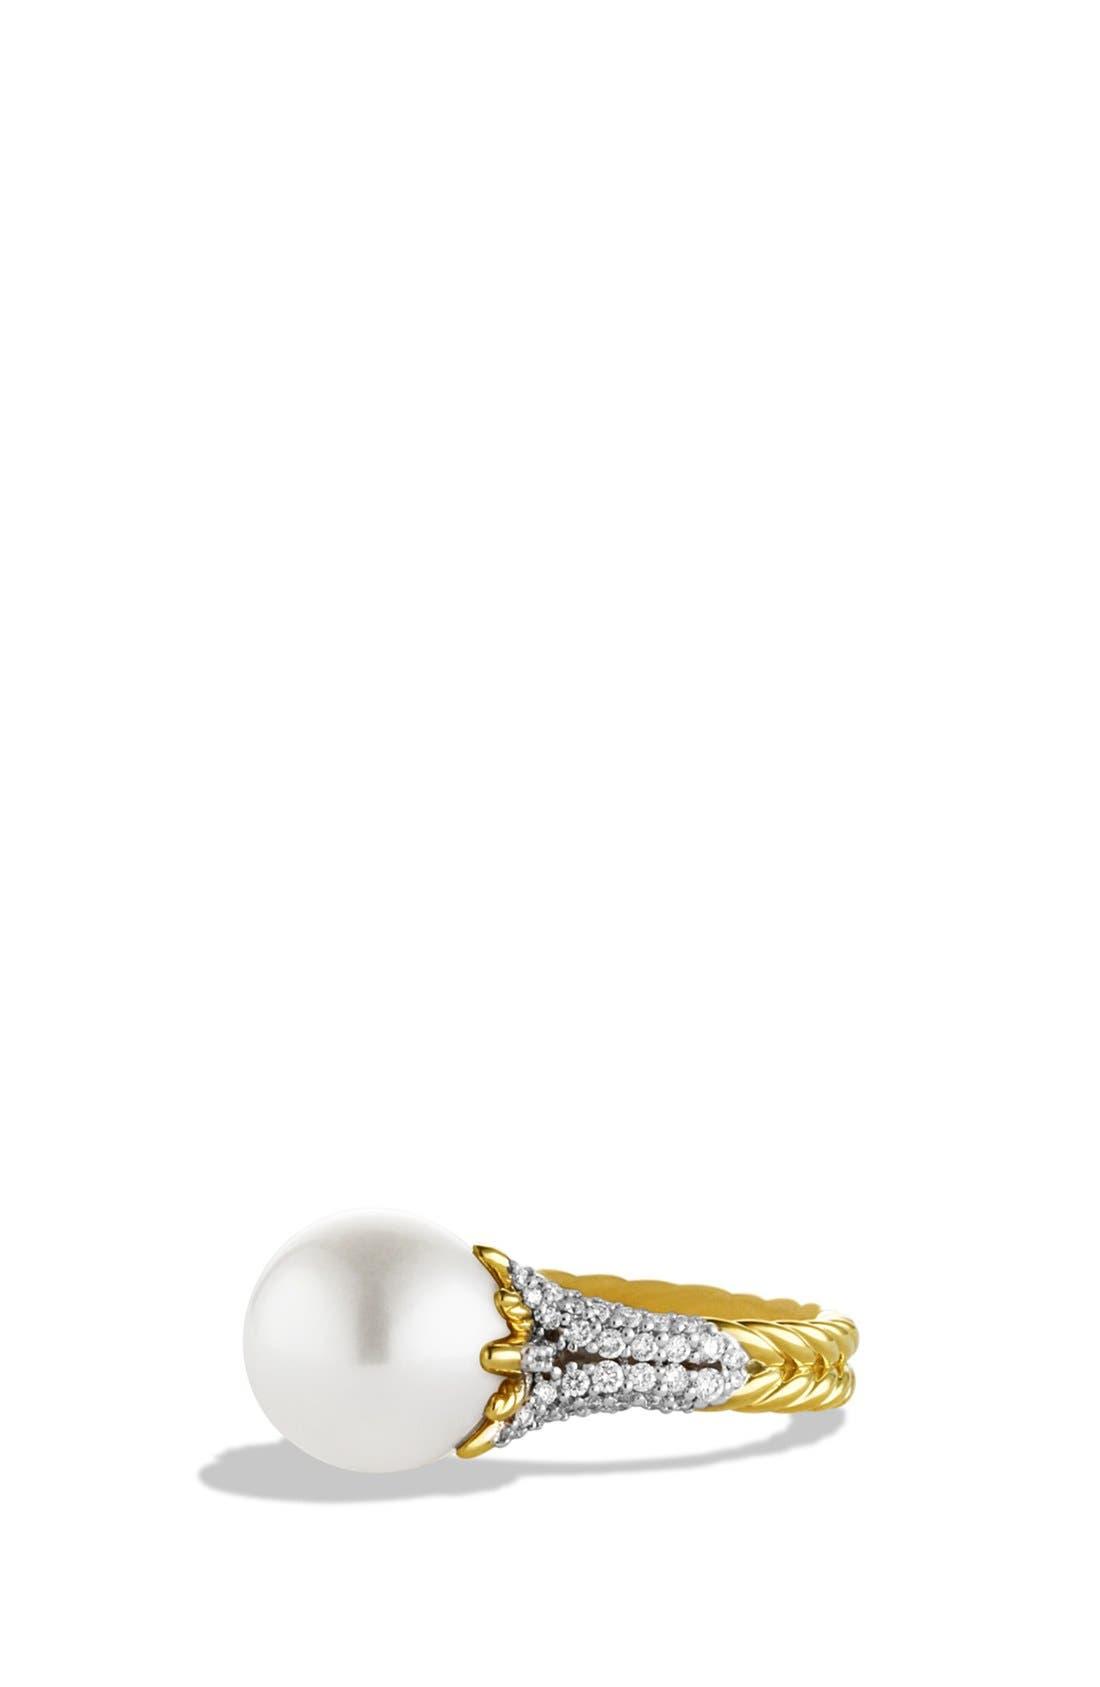 Main Image - David Yurman 'Starburst' Pearl Ring with Diamonds in Gold